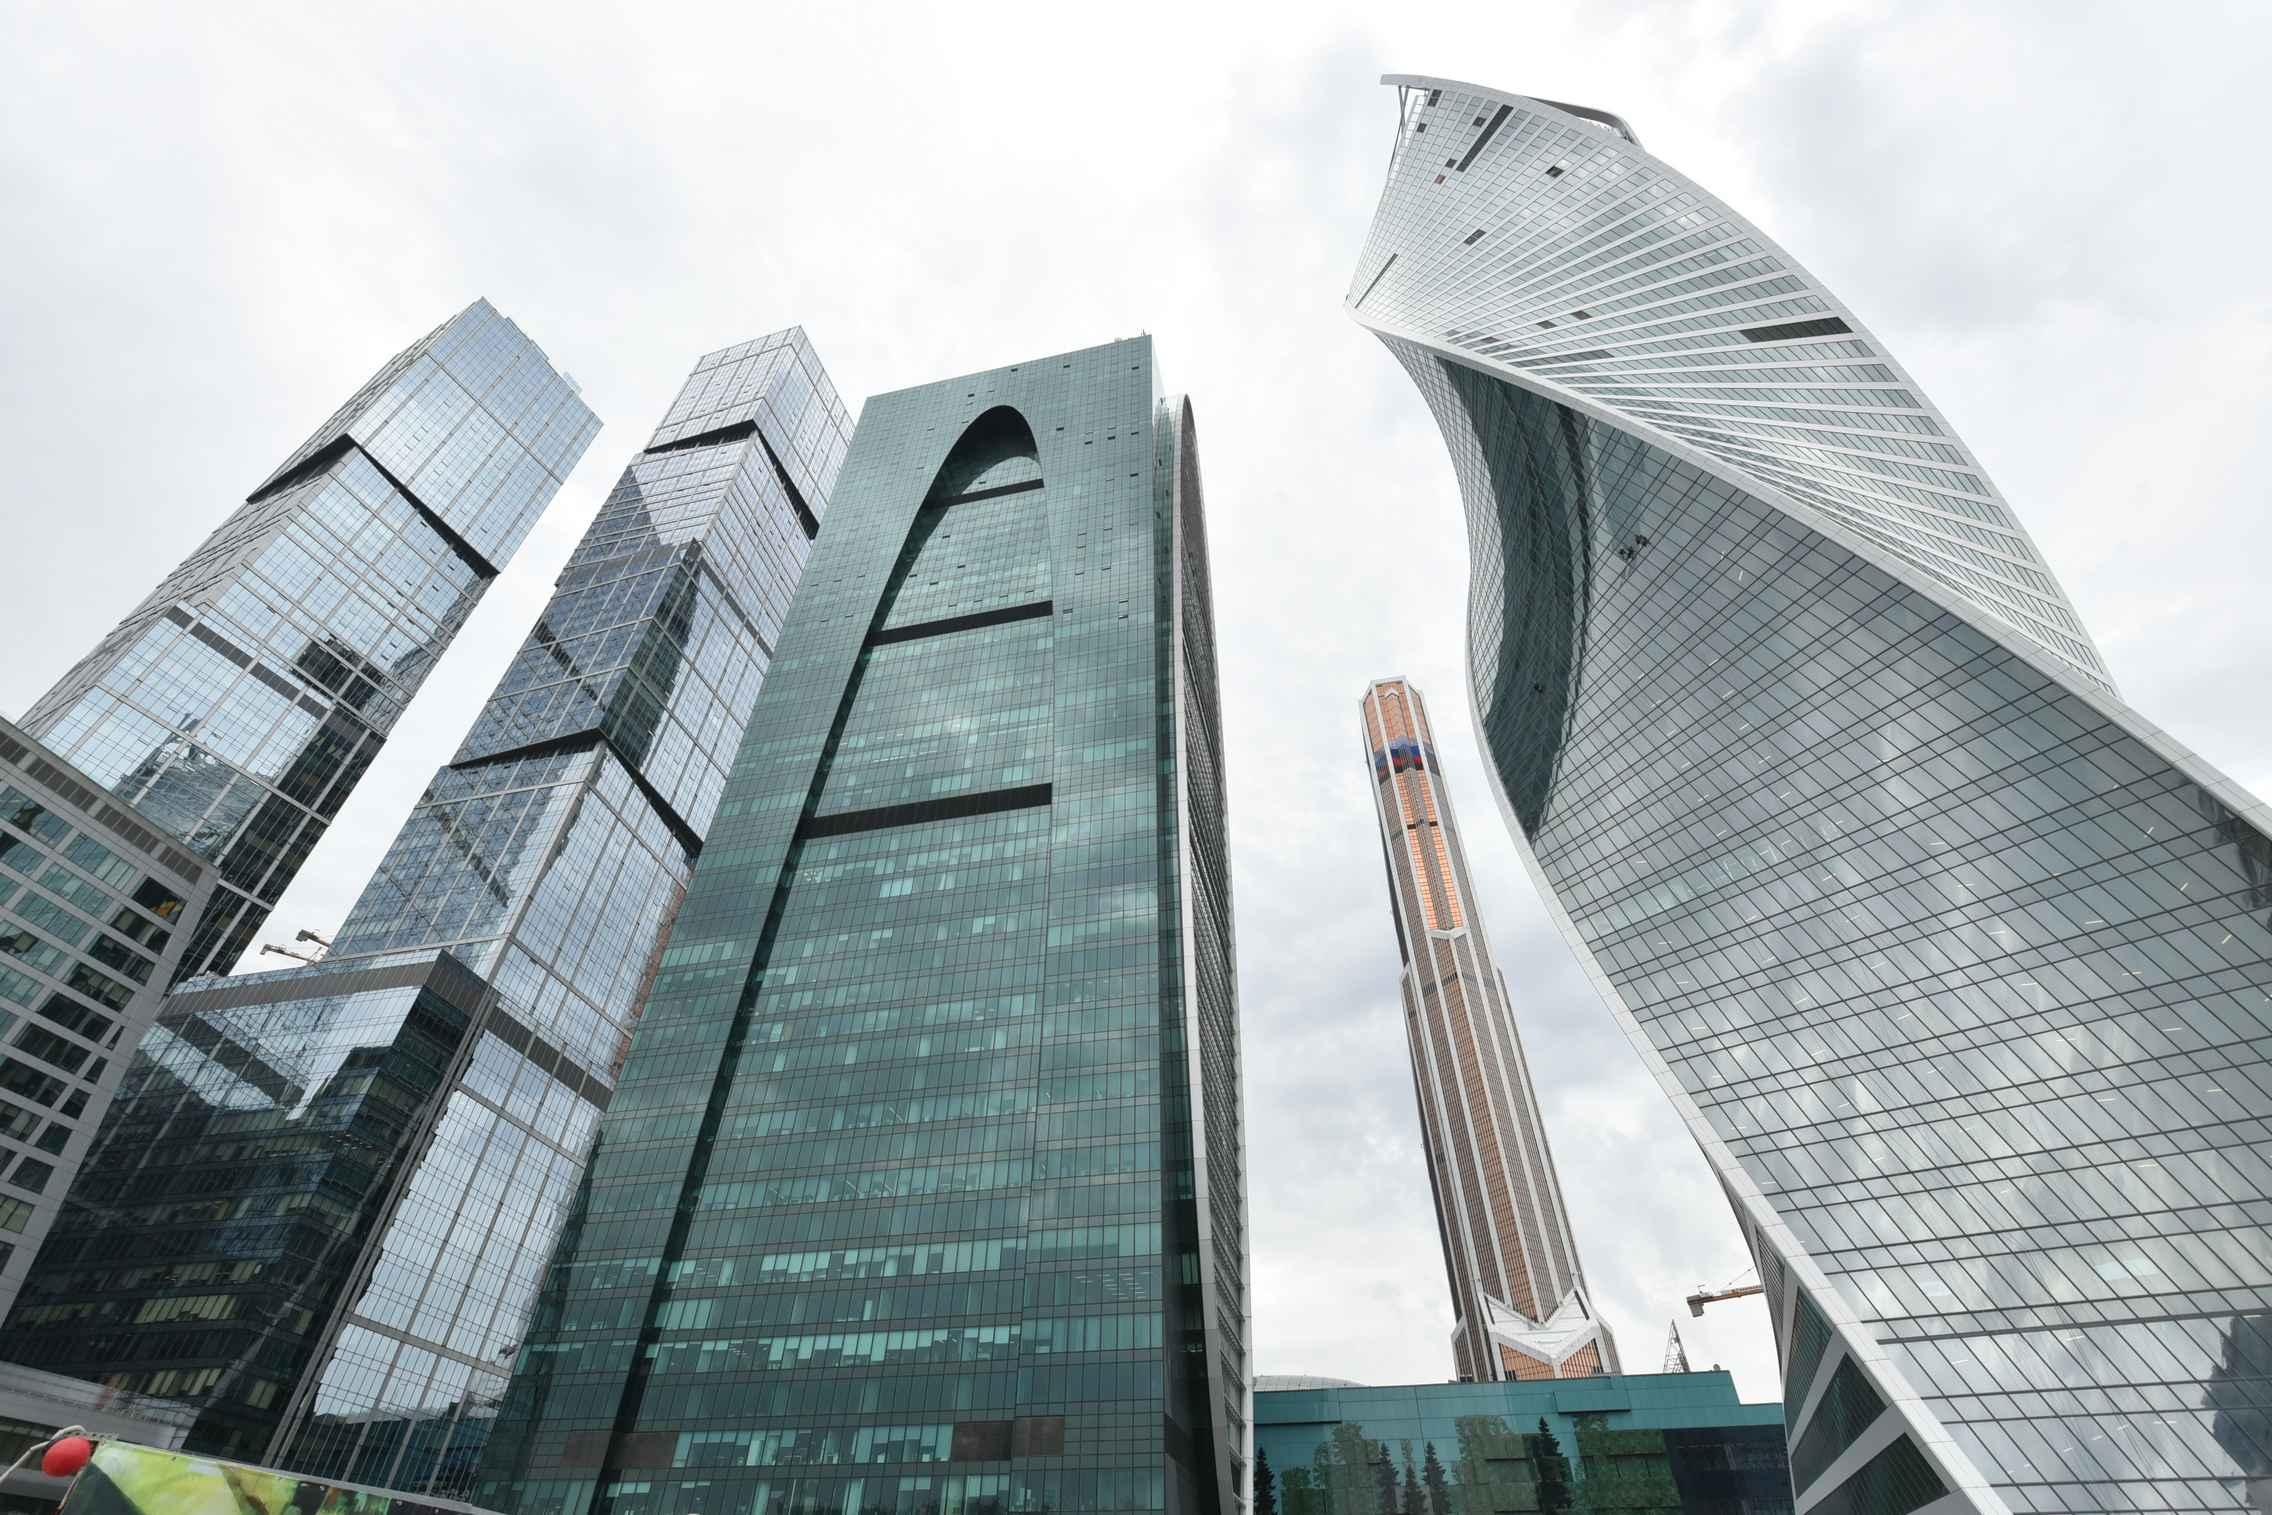 Photo of Бизнес на высоте. Коворкинг в Москва-Сити Бизнес на высоте. Коворкинг в Москва-Сити Бизнес на высоте. Коворкинг в Москва-Сити NOV 86511